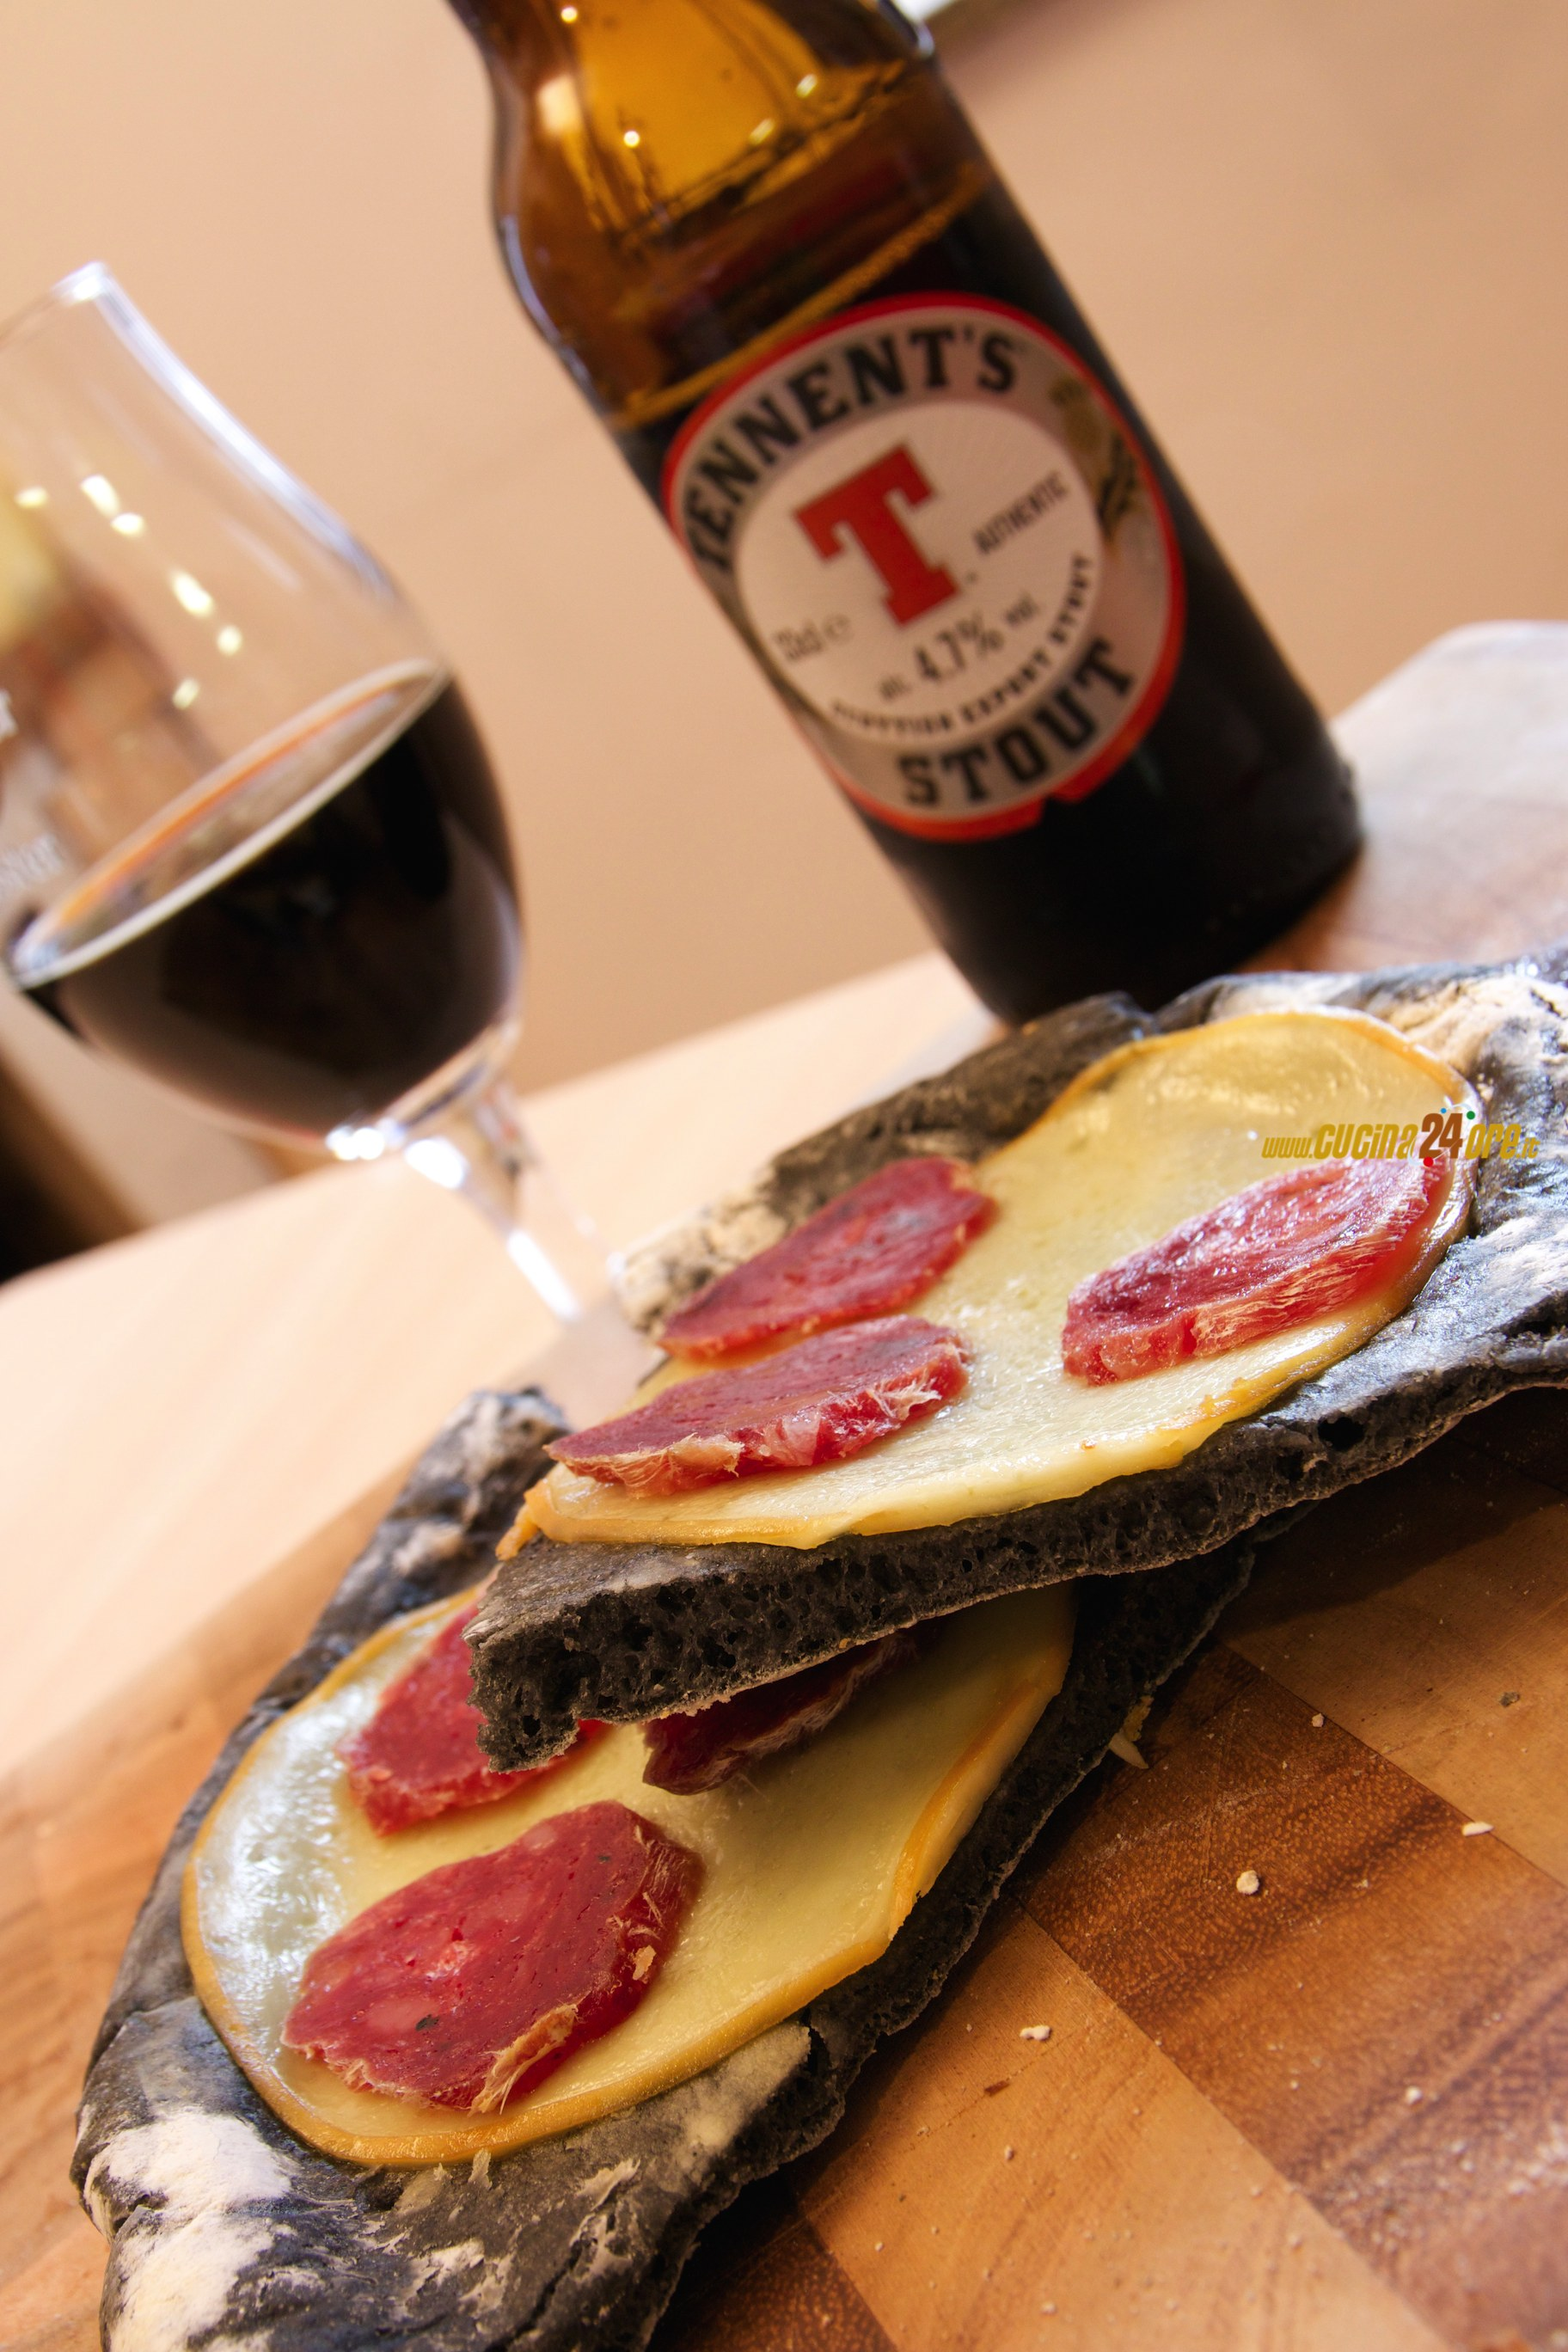 Pizza Nera al Carbone Vegetale con Scamorza Affumicata e Salame al Tartufo